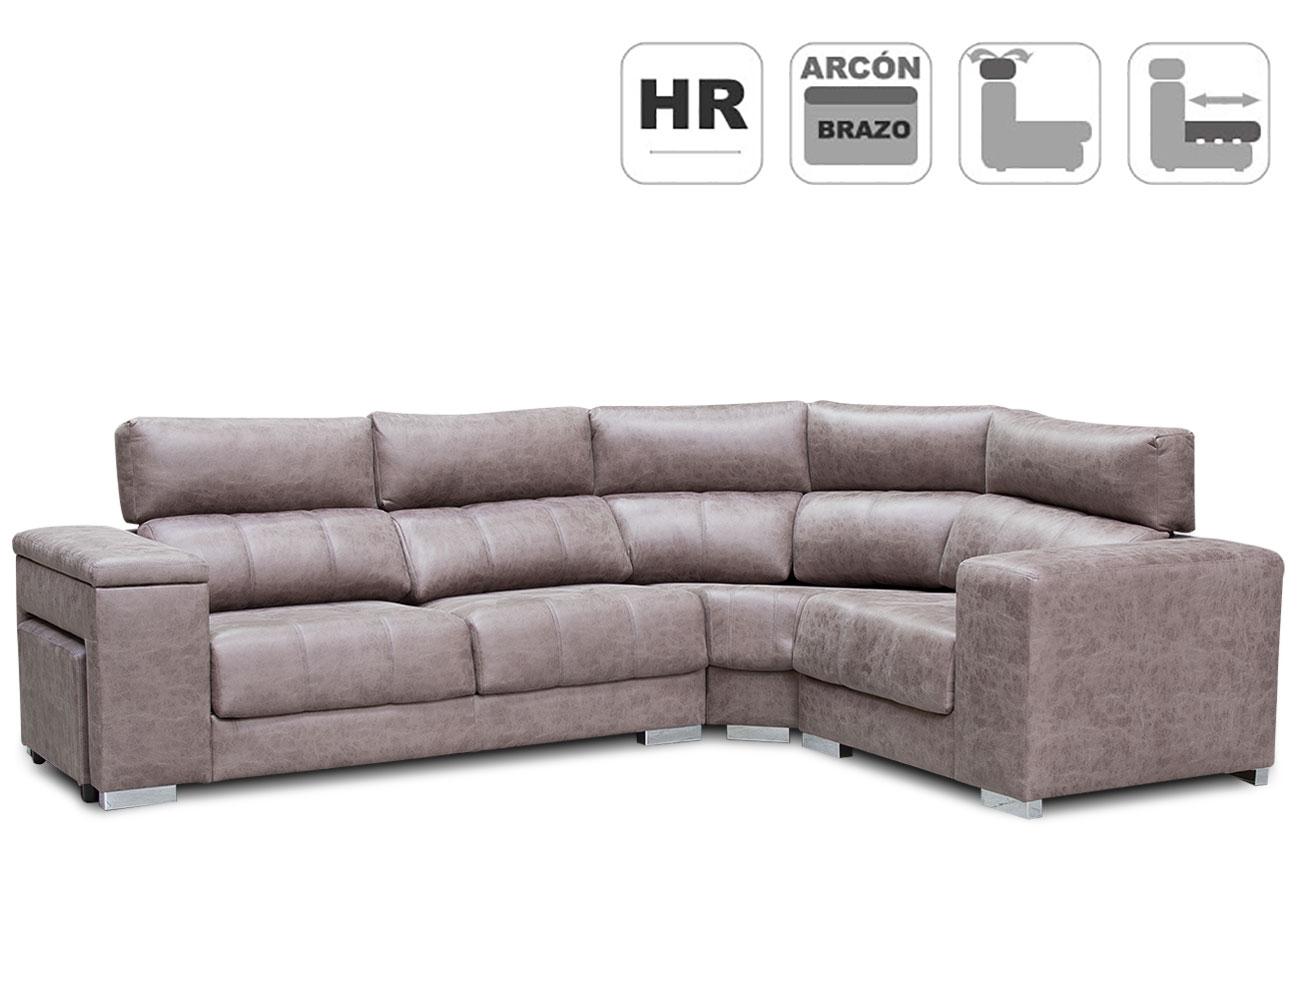 Sofa rinconeras l anti manchas detalle